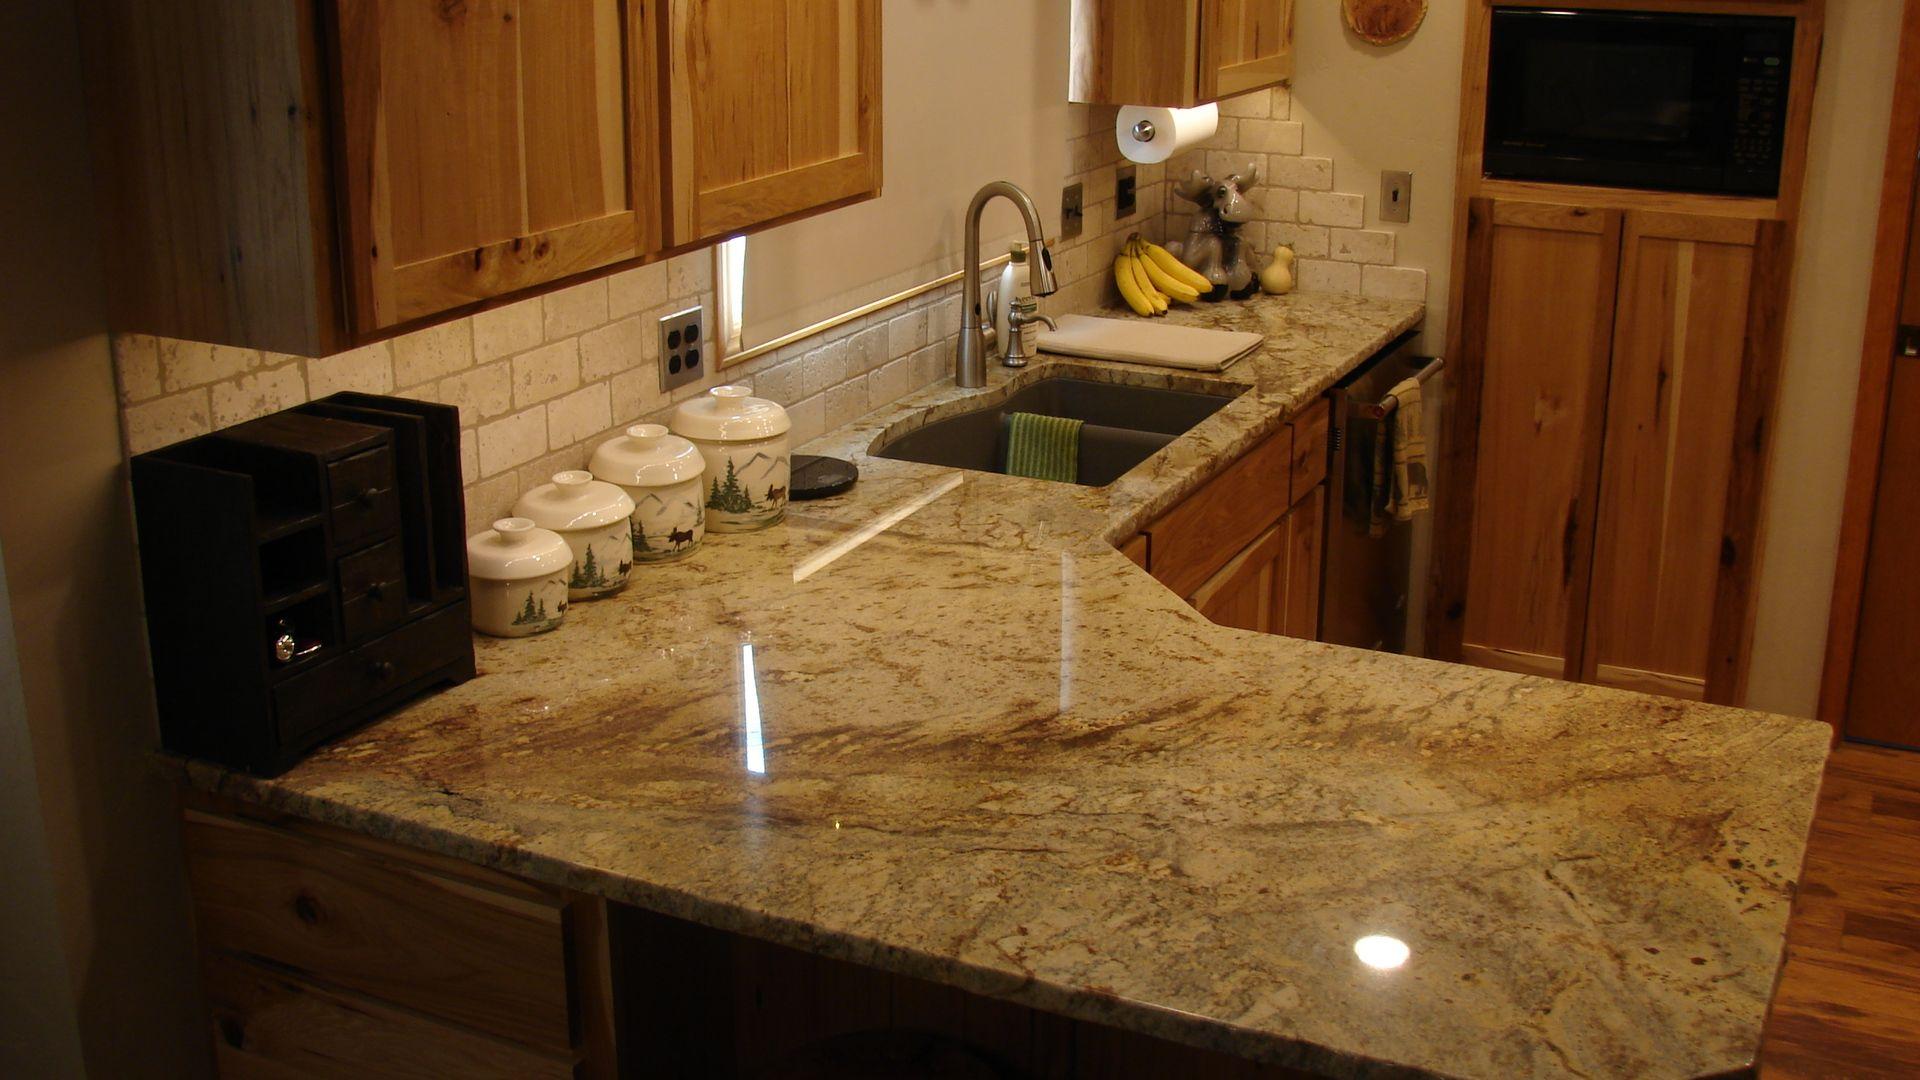 3cm Typhoon Bordeaux Granite with Composite Granite sink by Blanco ...